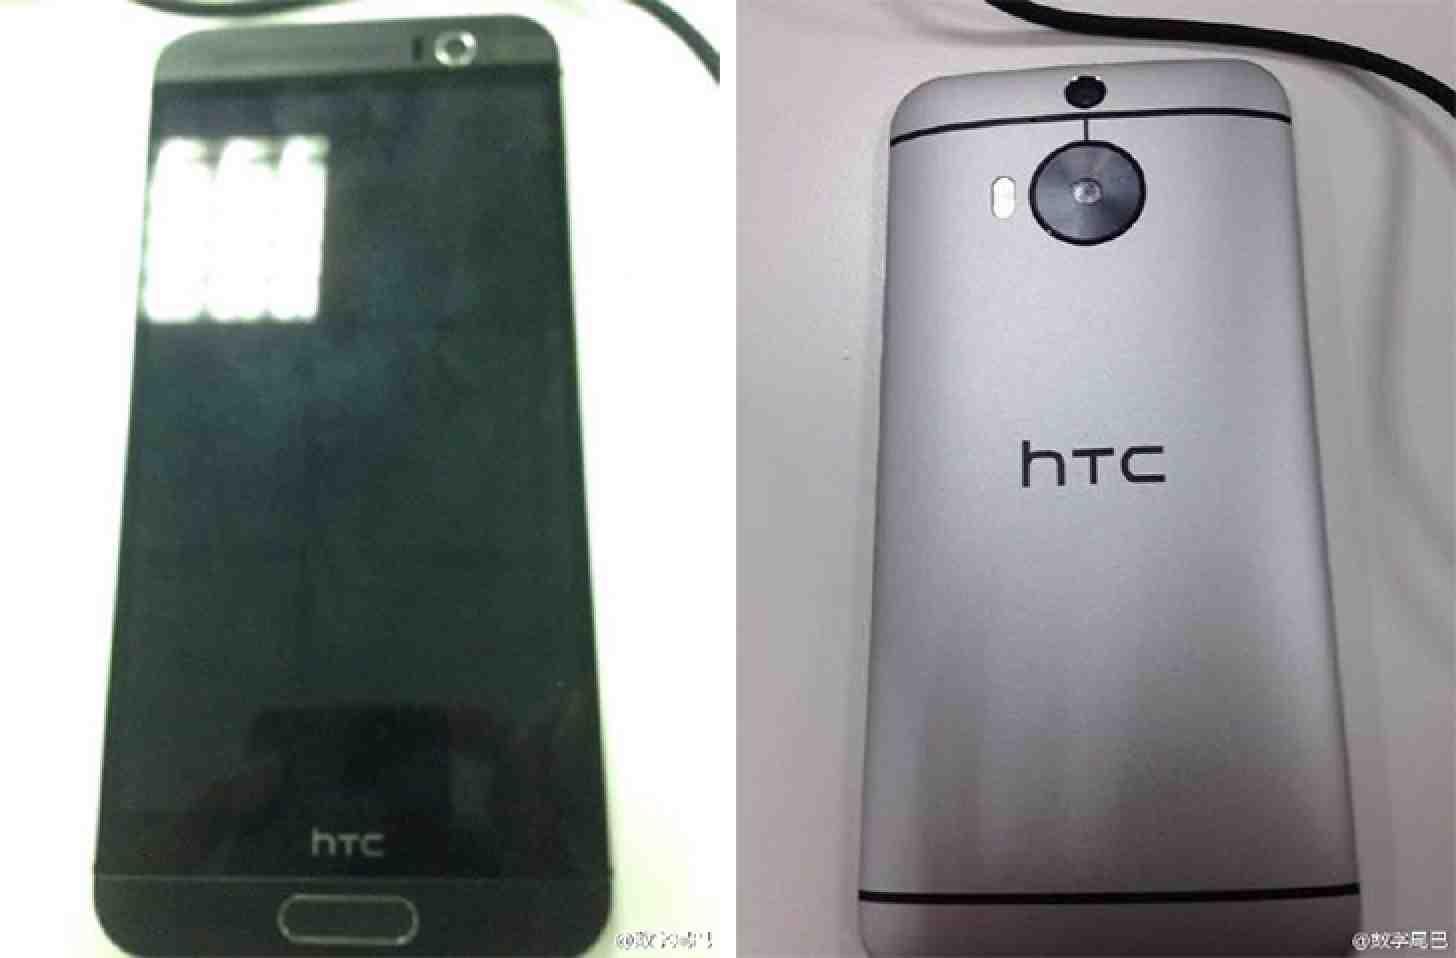 HTC One M9 Plus, fotografía filtrada anteriormente